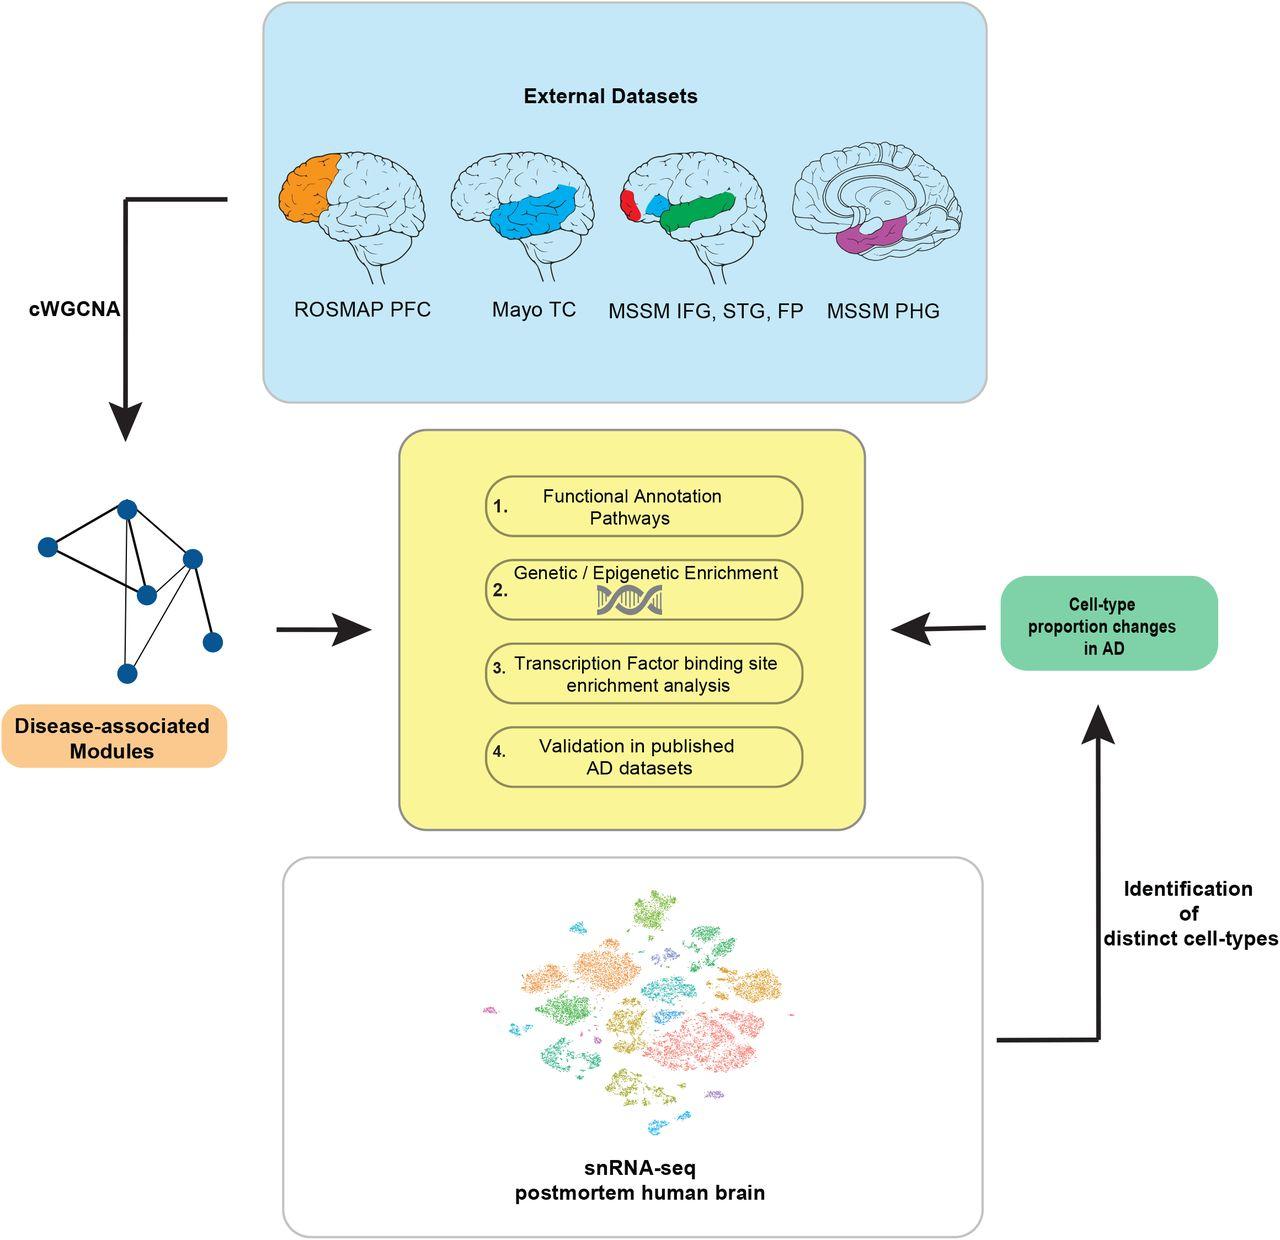 Integrative genomics approach identifies conserved